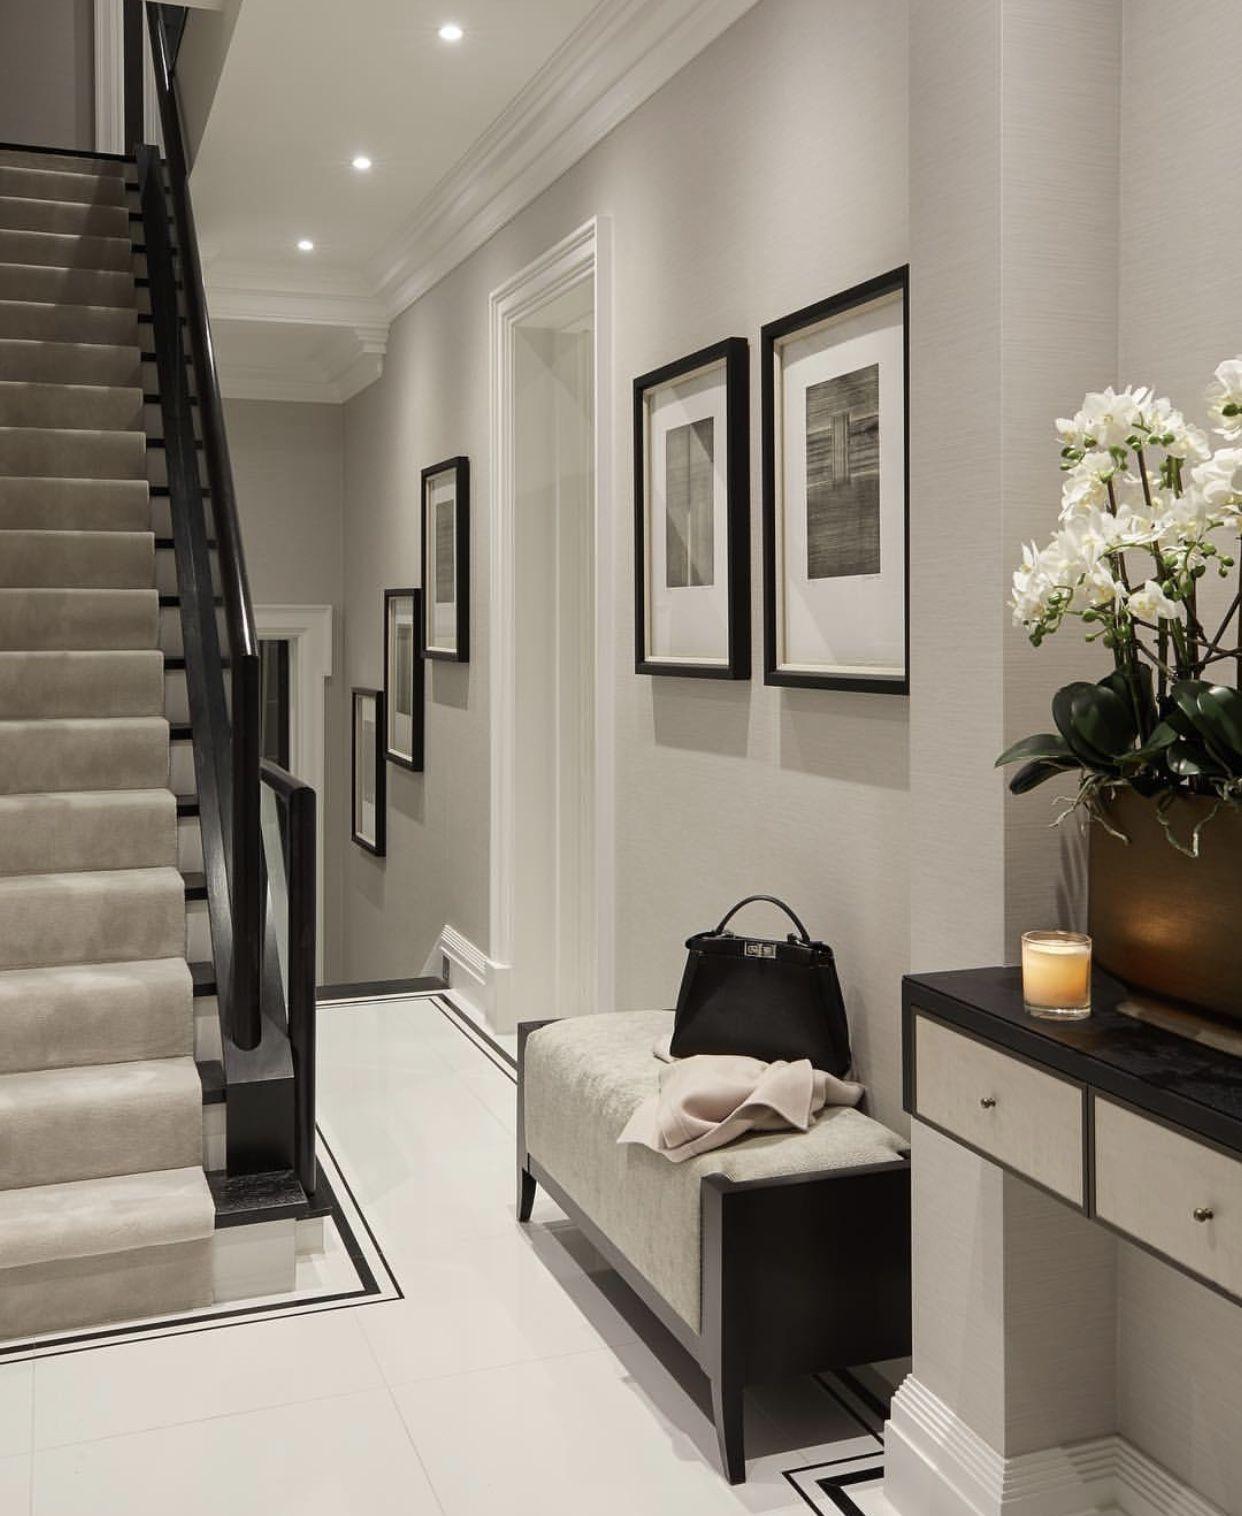 Hallway Ideas Grey Walls Grey Carpet Hall Decor Hallway Designs Hallway Inspiration